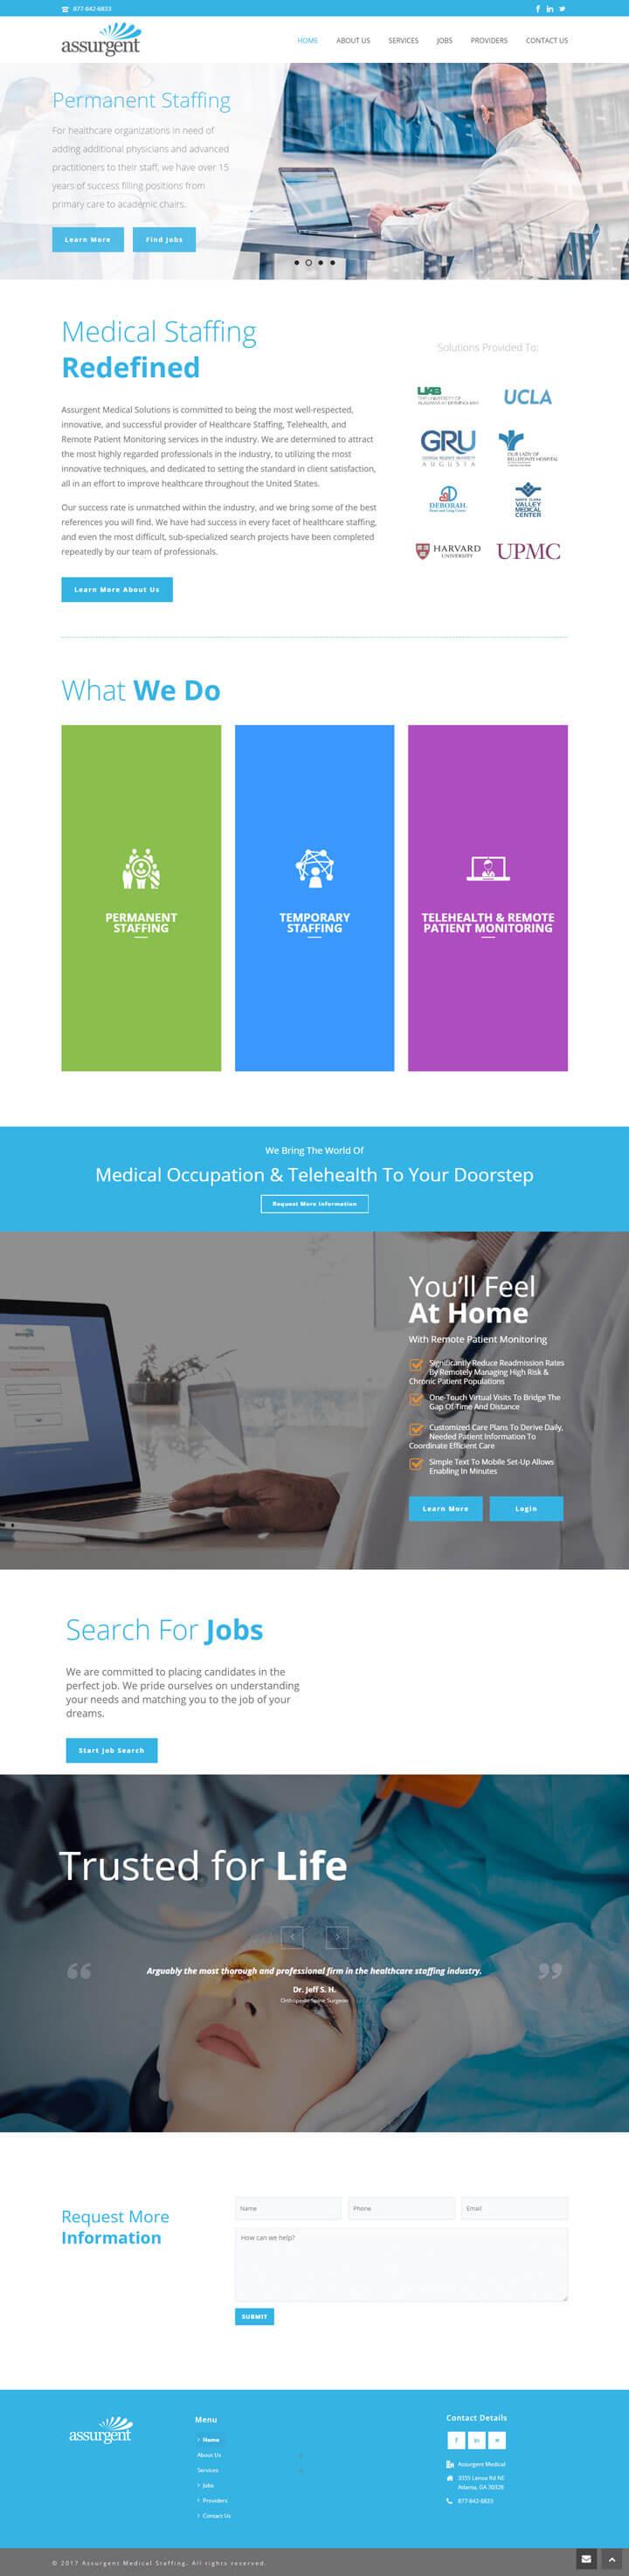 Web Design - SEO | Knoxweb Marketing | Website Development